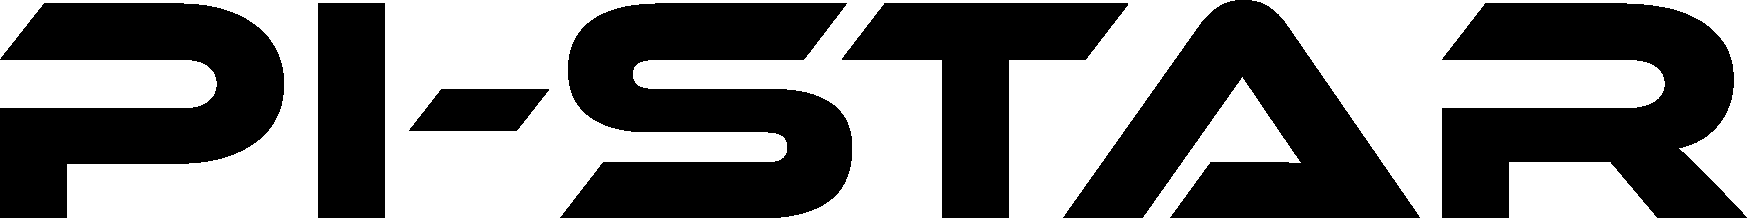 Pi-Star_Logo_Full_Black_on_Trans